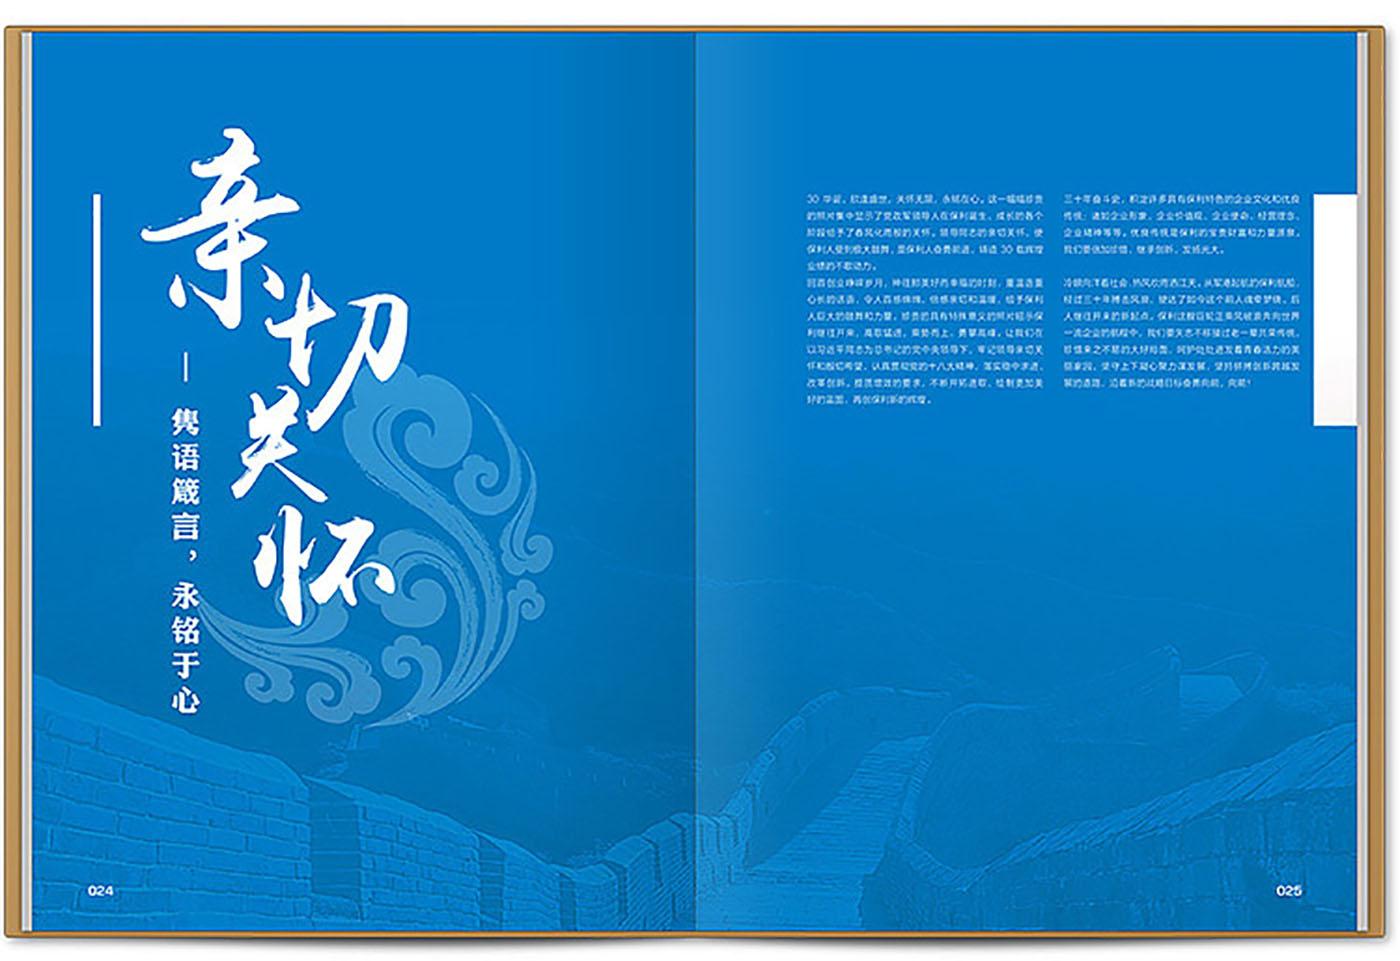 高端企业周年纪念册,高端企业周年纪念册设计公司